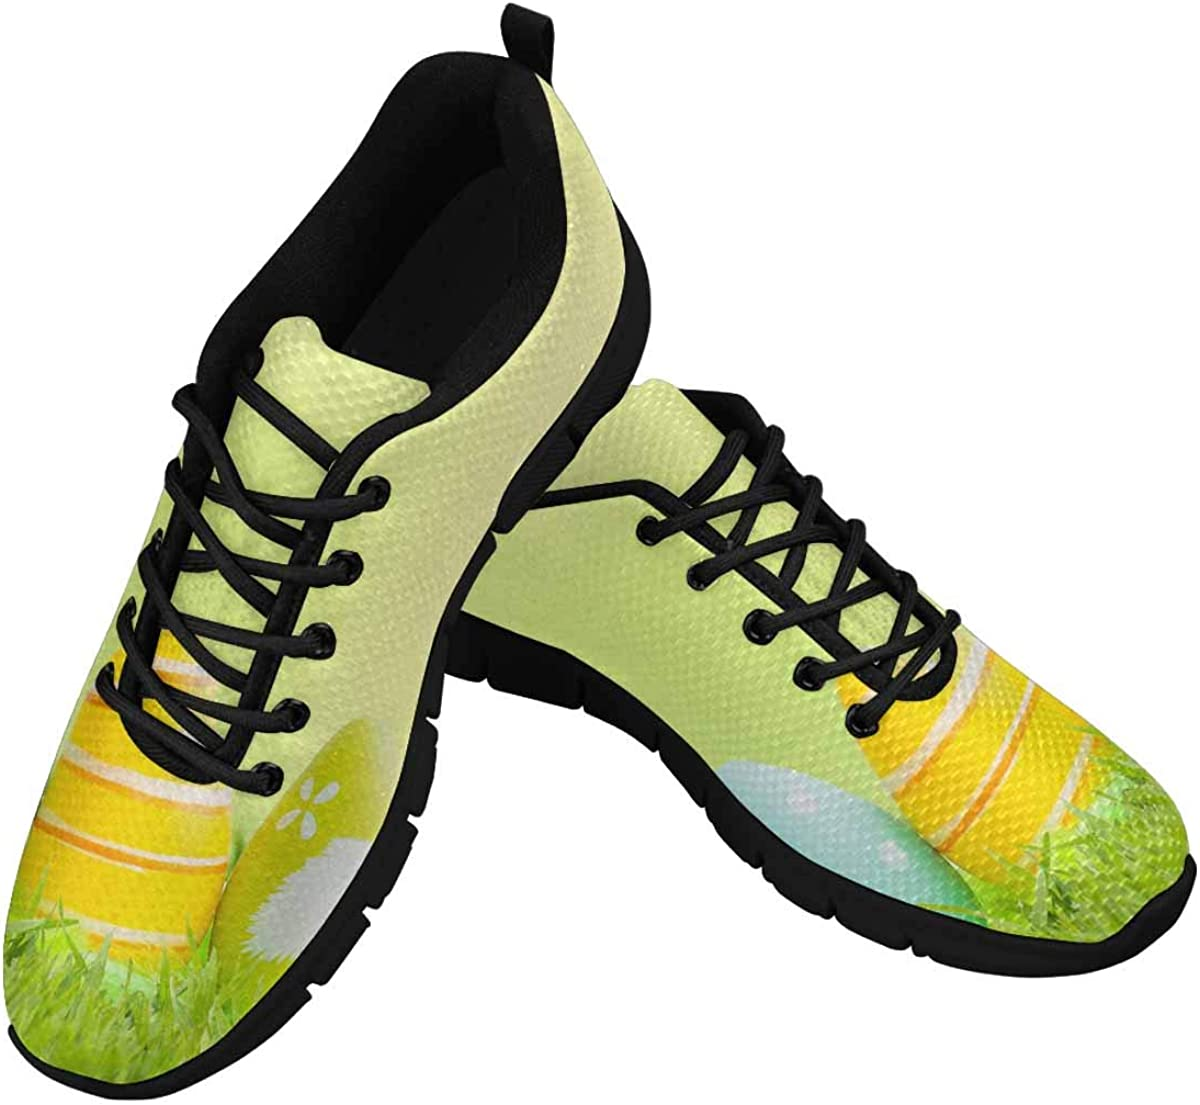 InterestPrint Green Grass, Easter Eggs Women's Athletic Walking Shoes Breathe Comfort Mesh